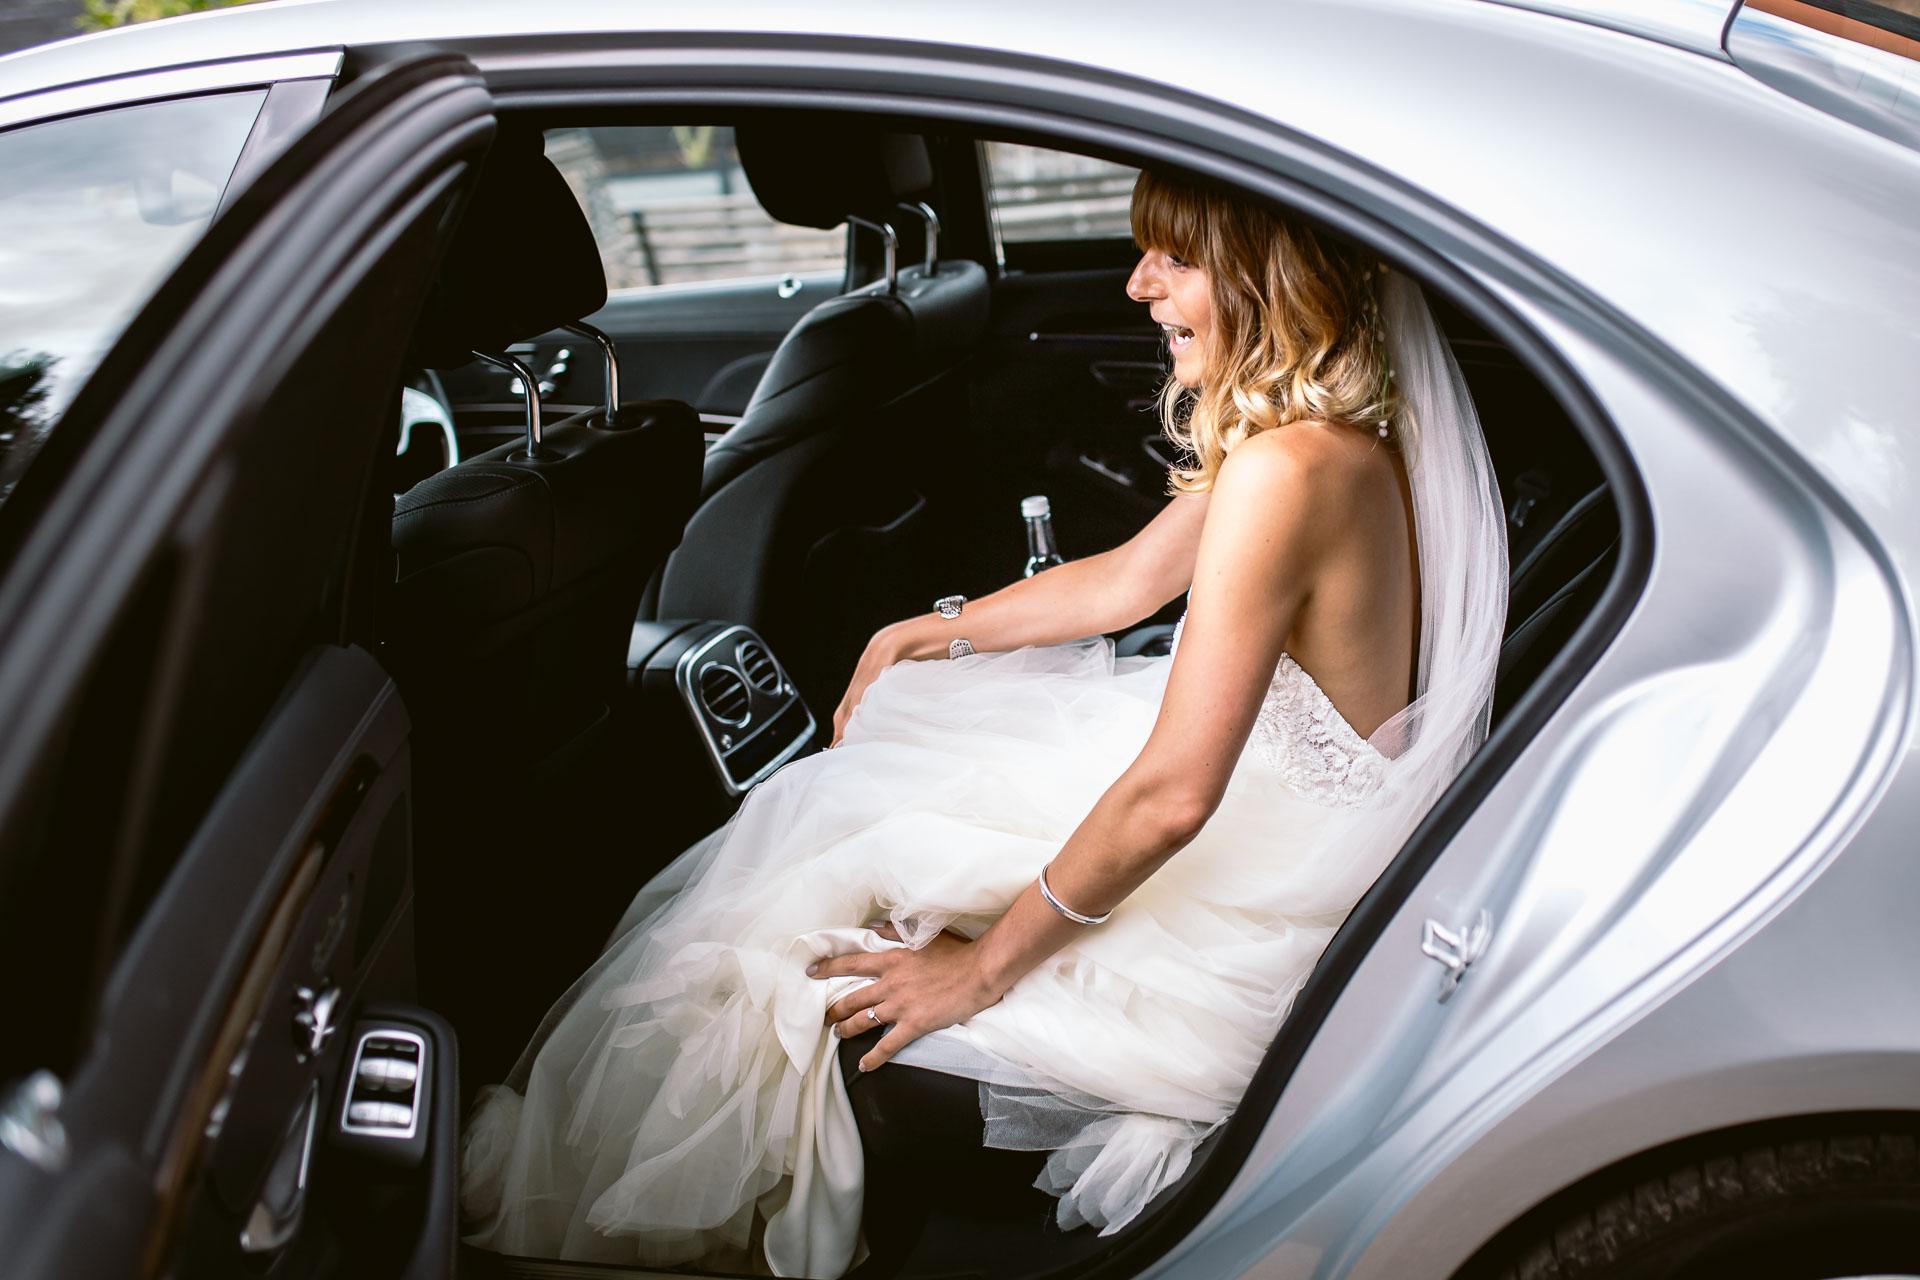 preston court boho wedding alexia and dan bride arrives at the venue in wedding car